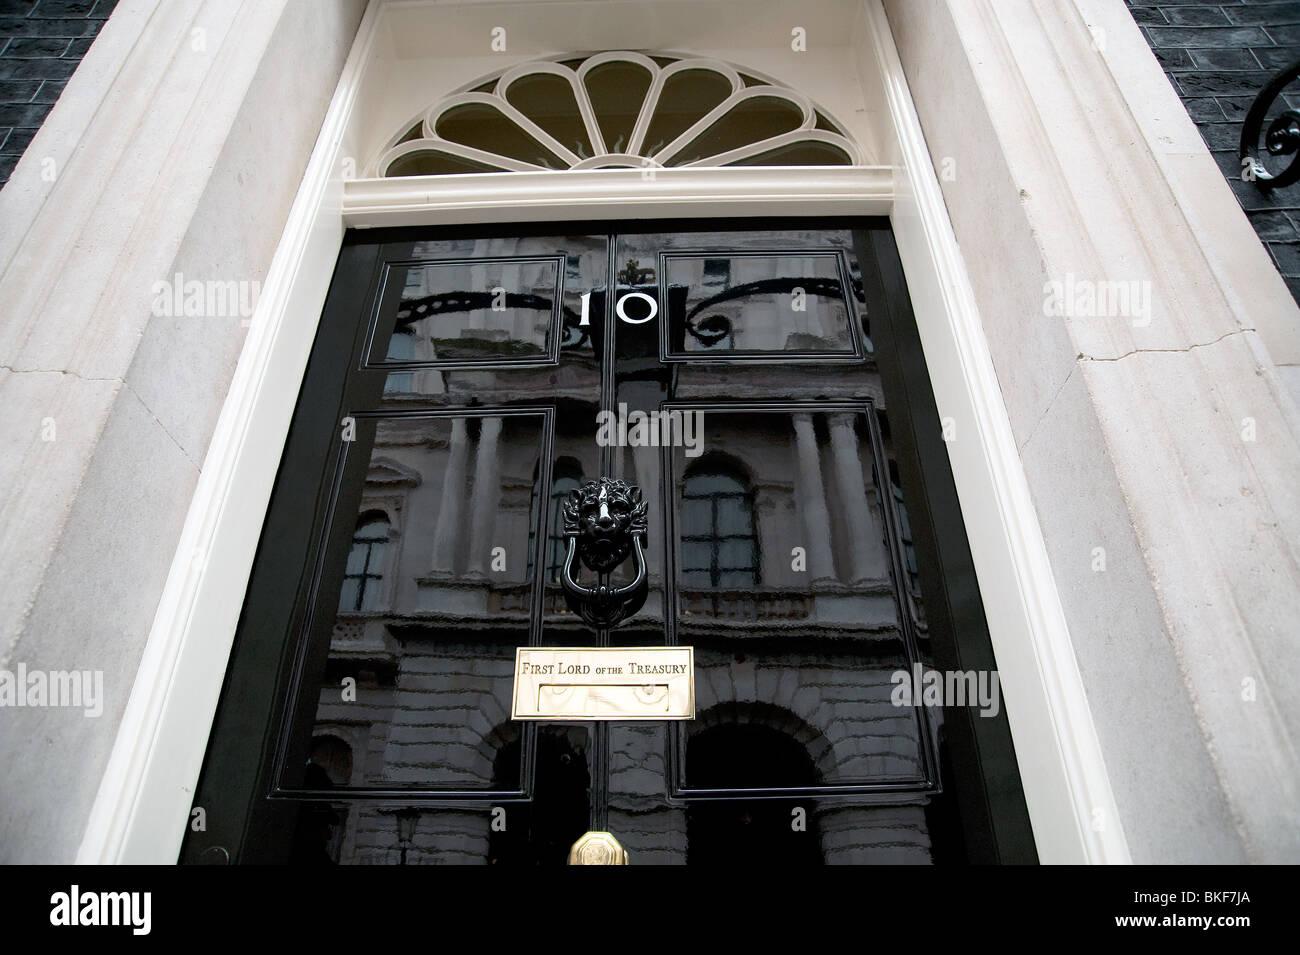 No 10 Downing street UK - Stock Image